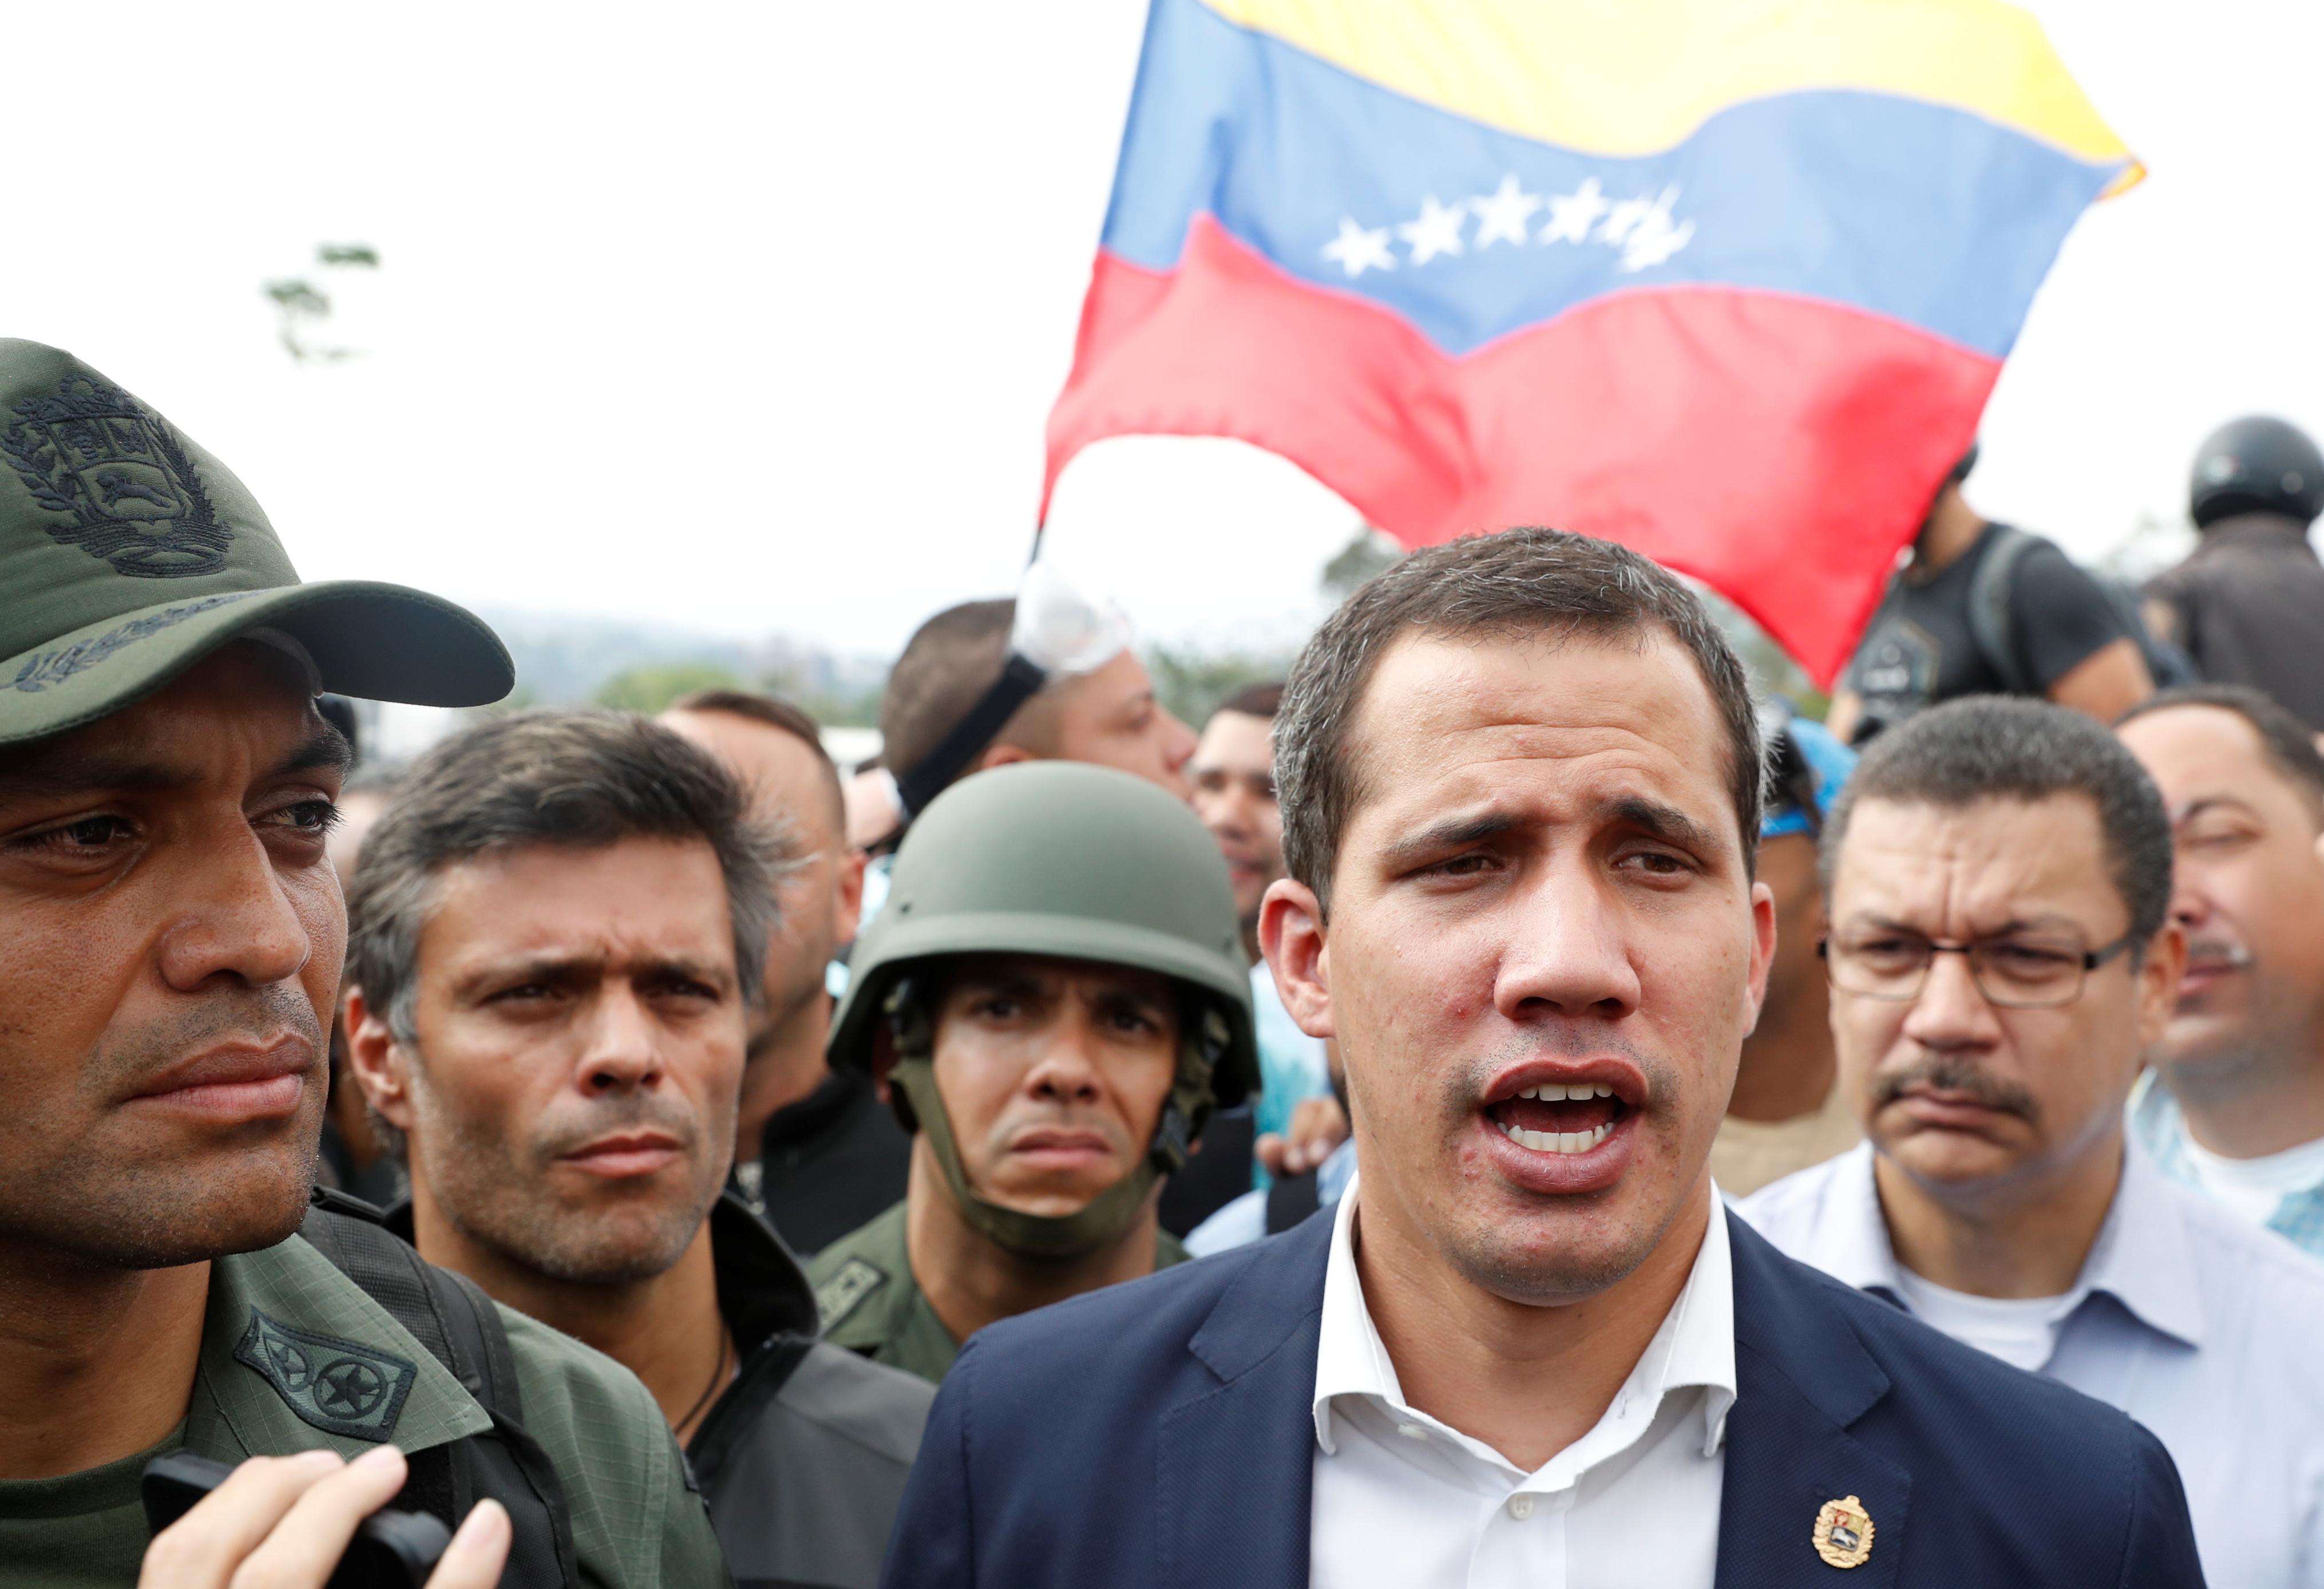 2019-04-30T143351Z_597339667_RC1417316C30_RTRMADP_3_VENEZUELA-POLITICS - Copy